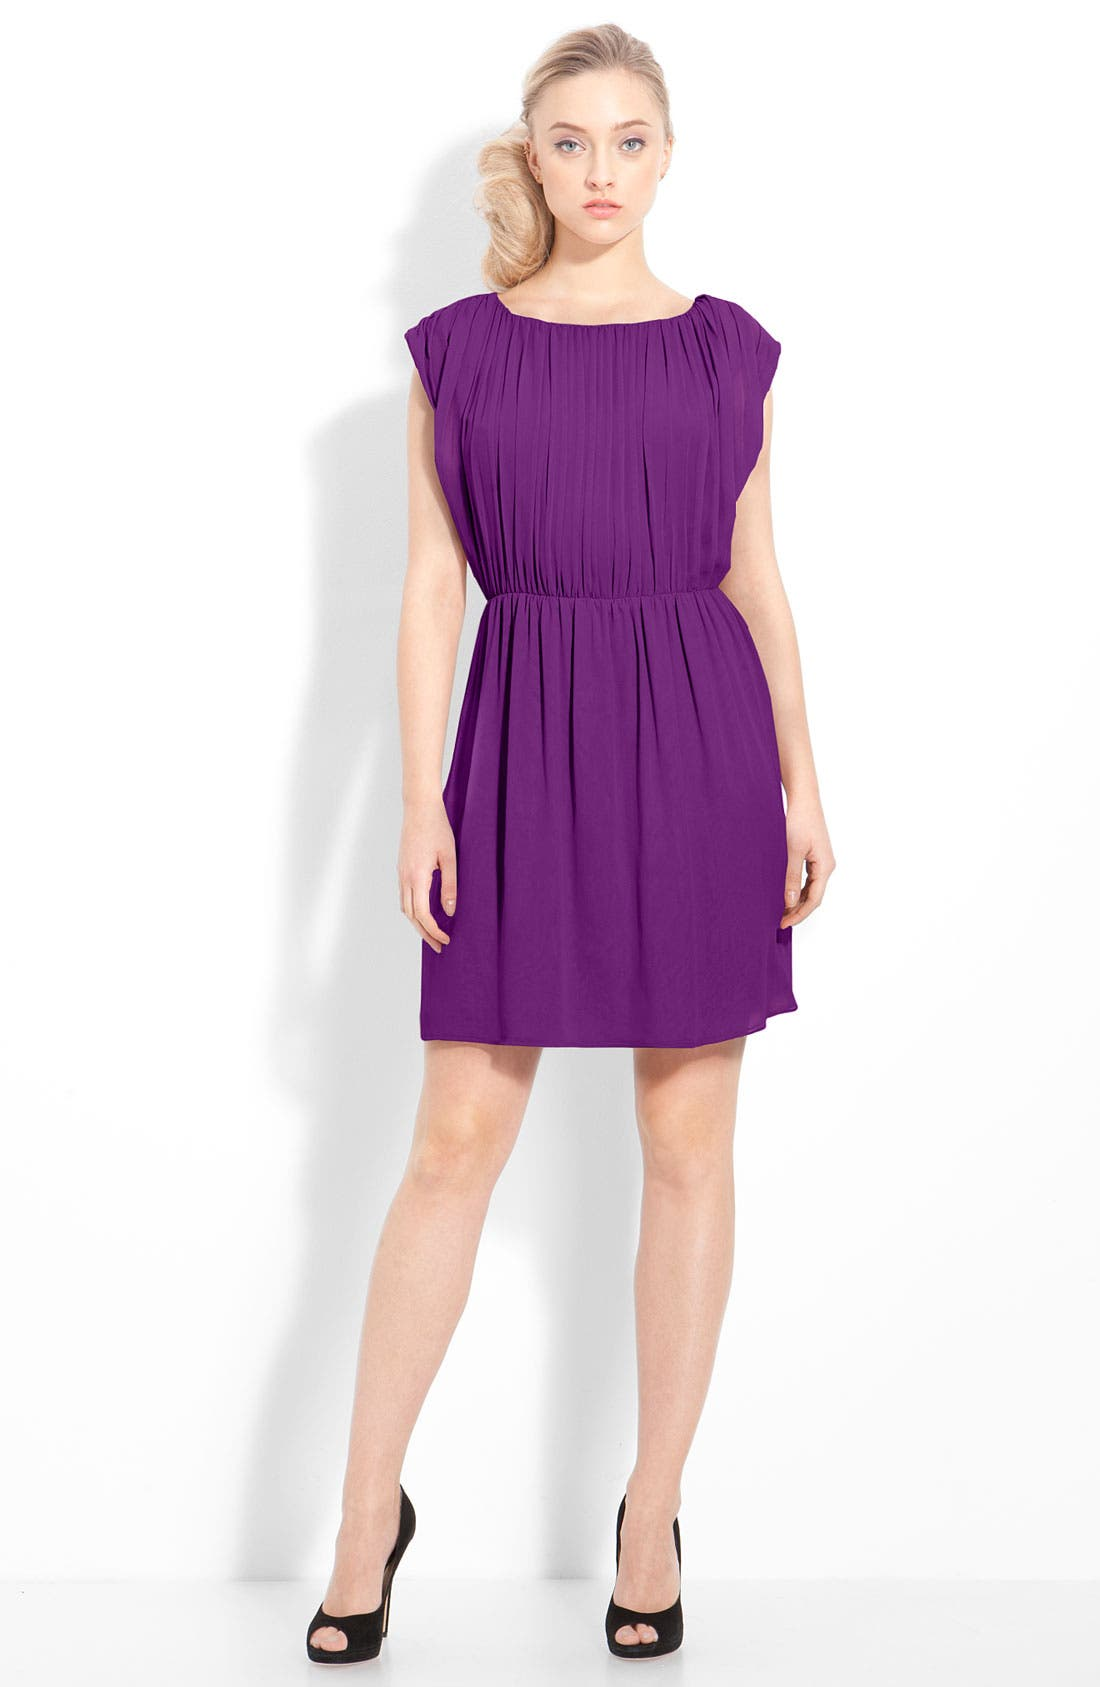 Alternate Image 1 Selected - Alice + Olivia 'Josie' Ruched Chiffon Dress